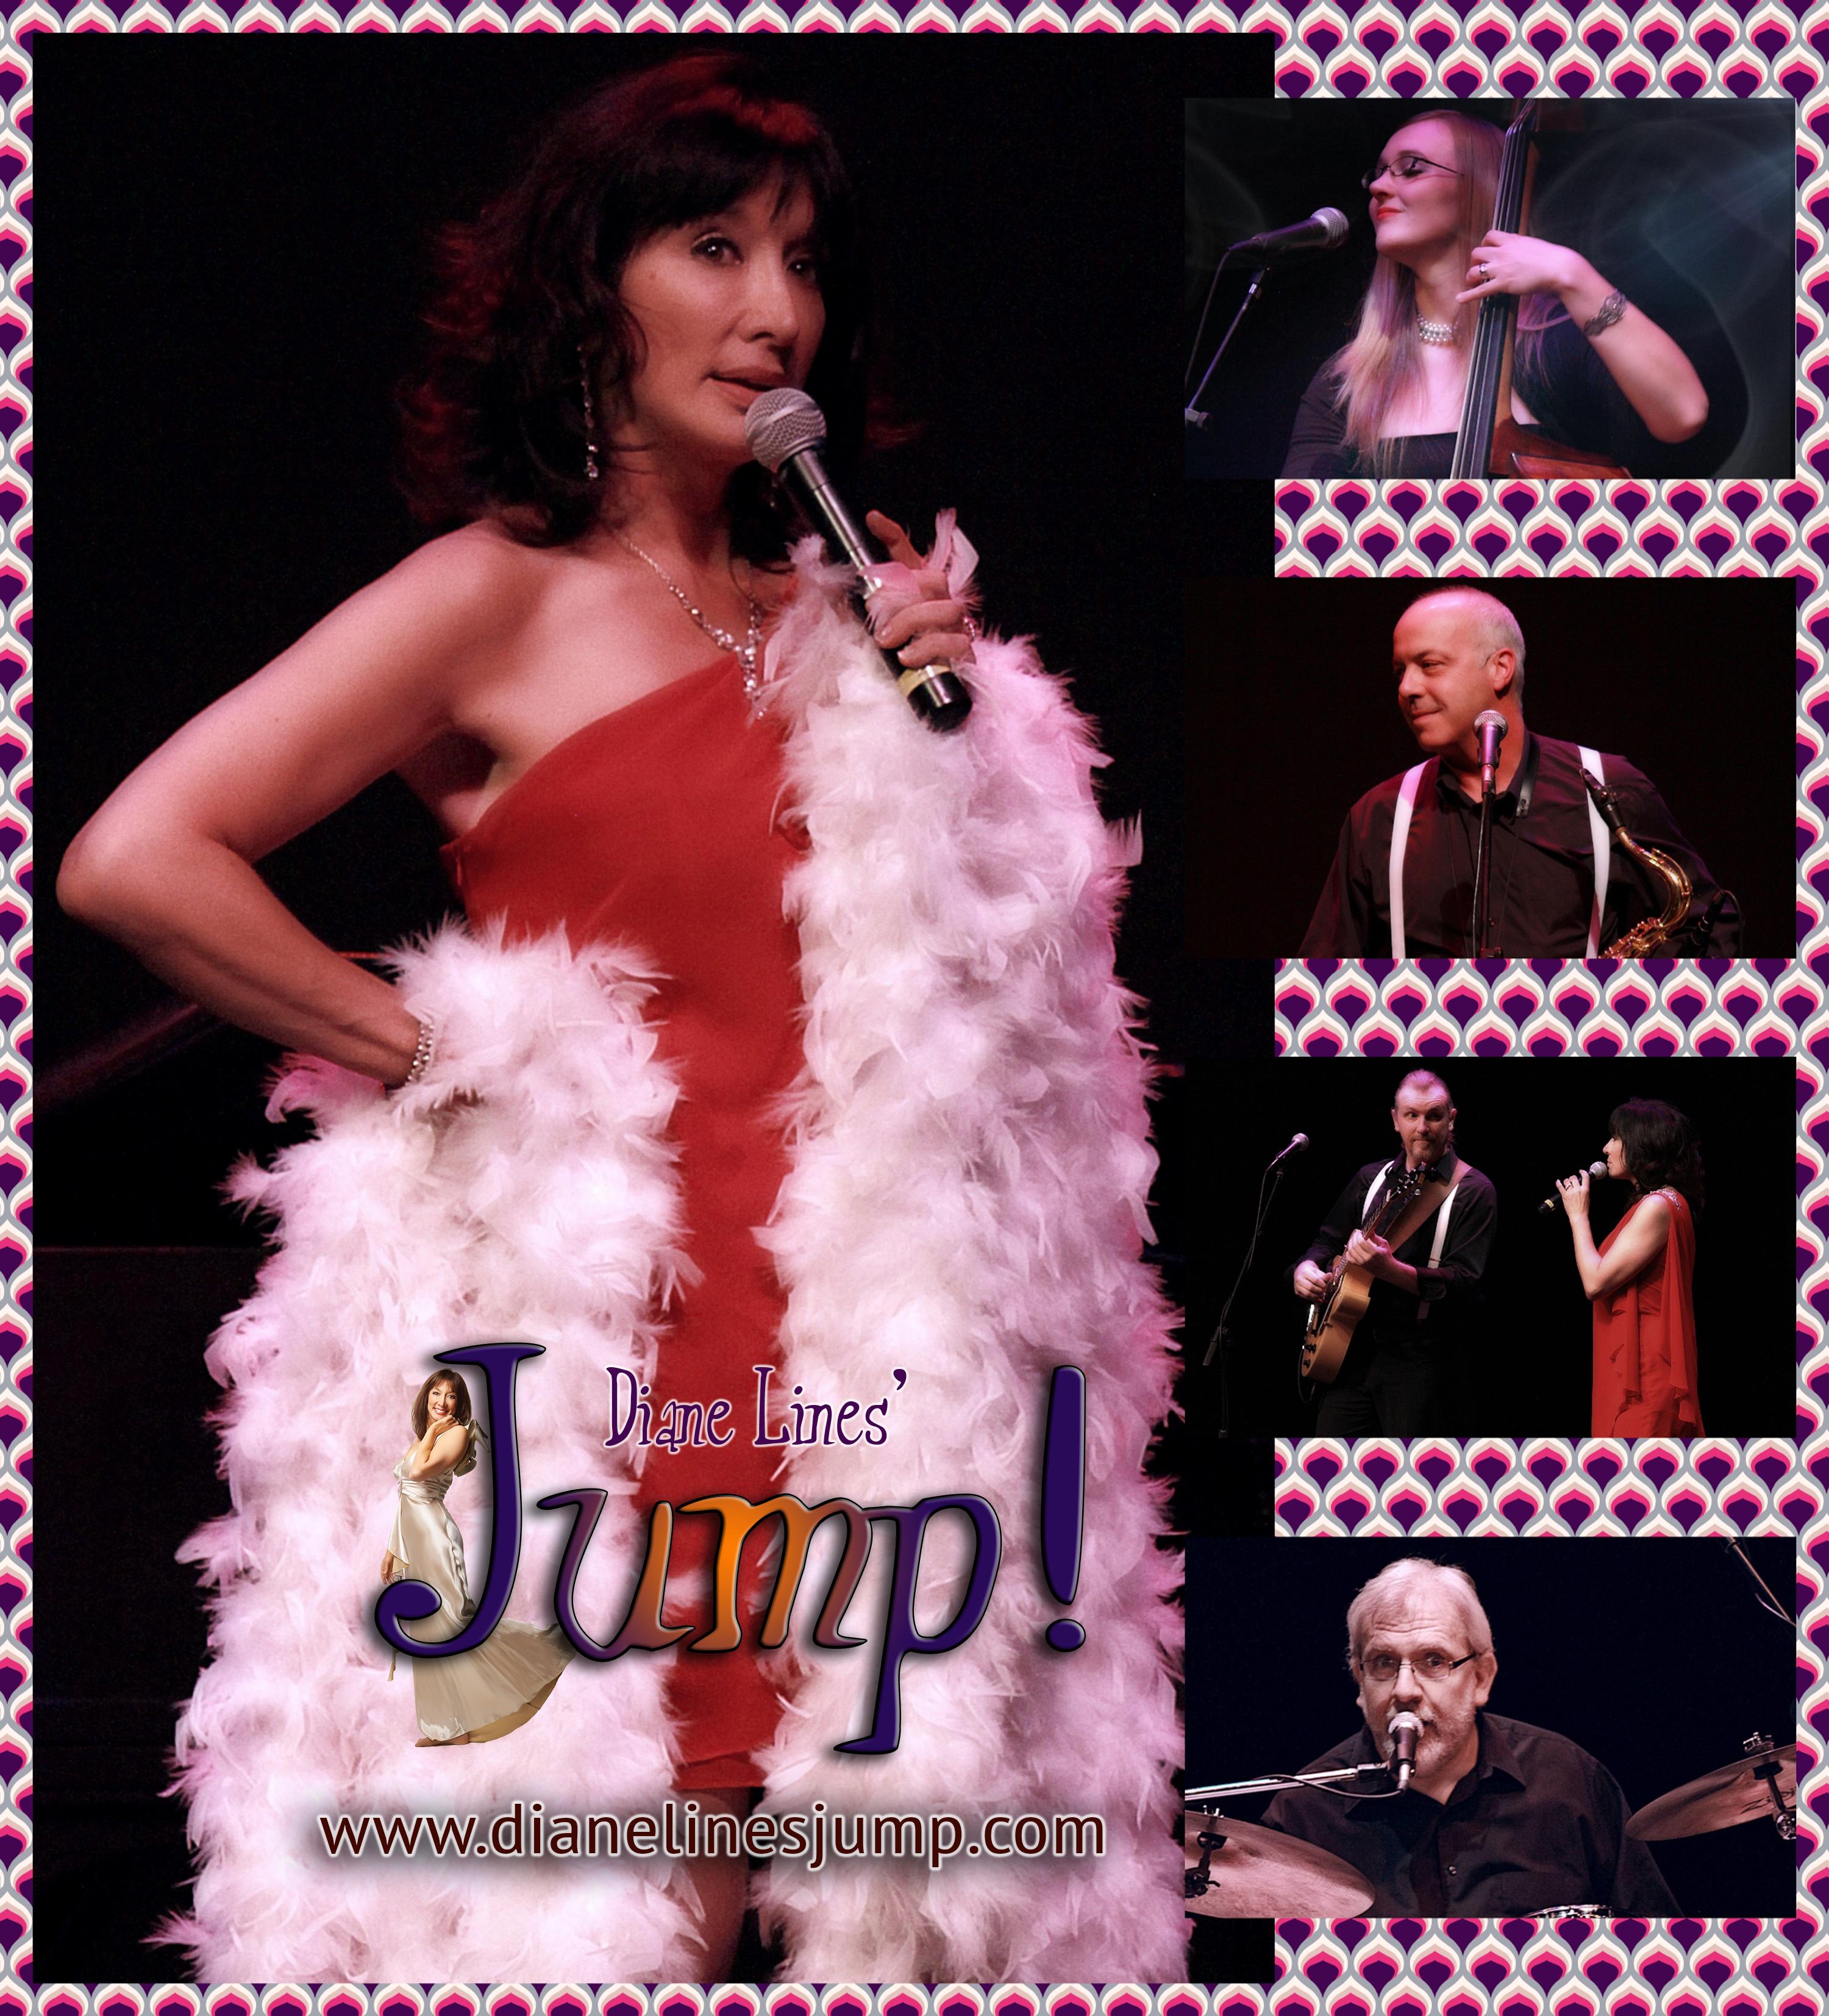 Diane Lines' Jump! cast